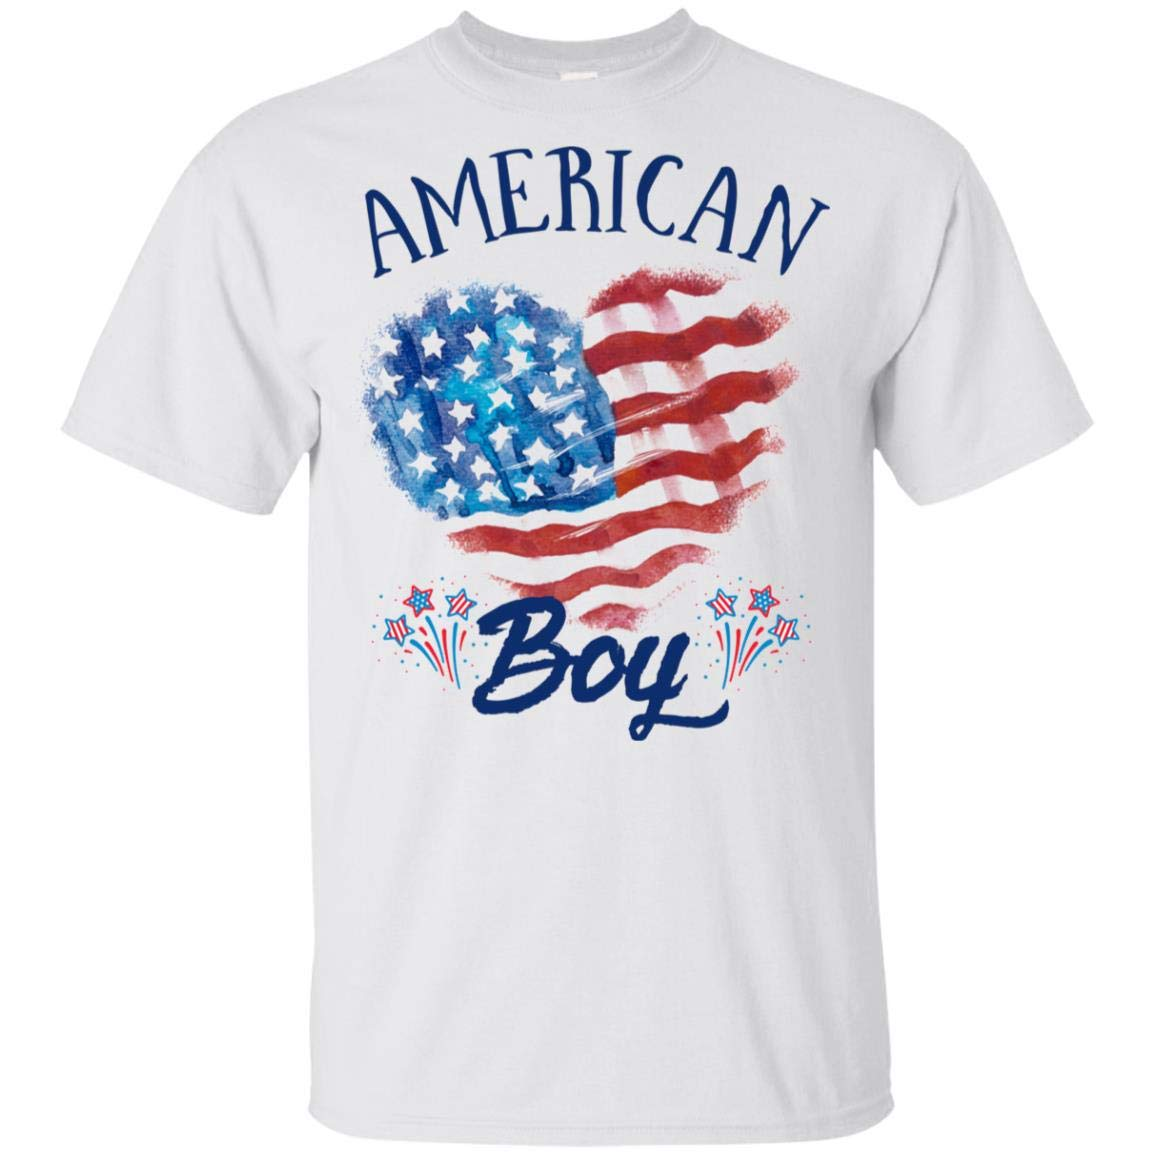 Americanboy Tshirt Family 4th Of July Shirt